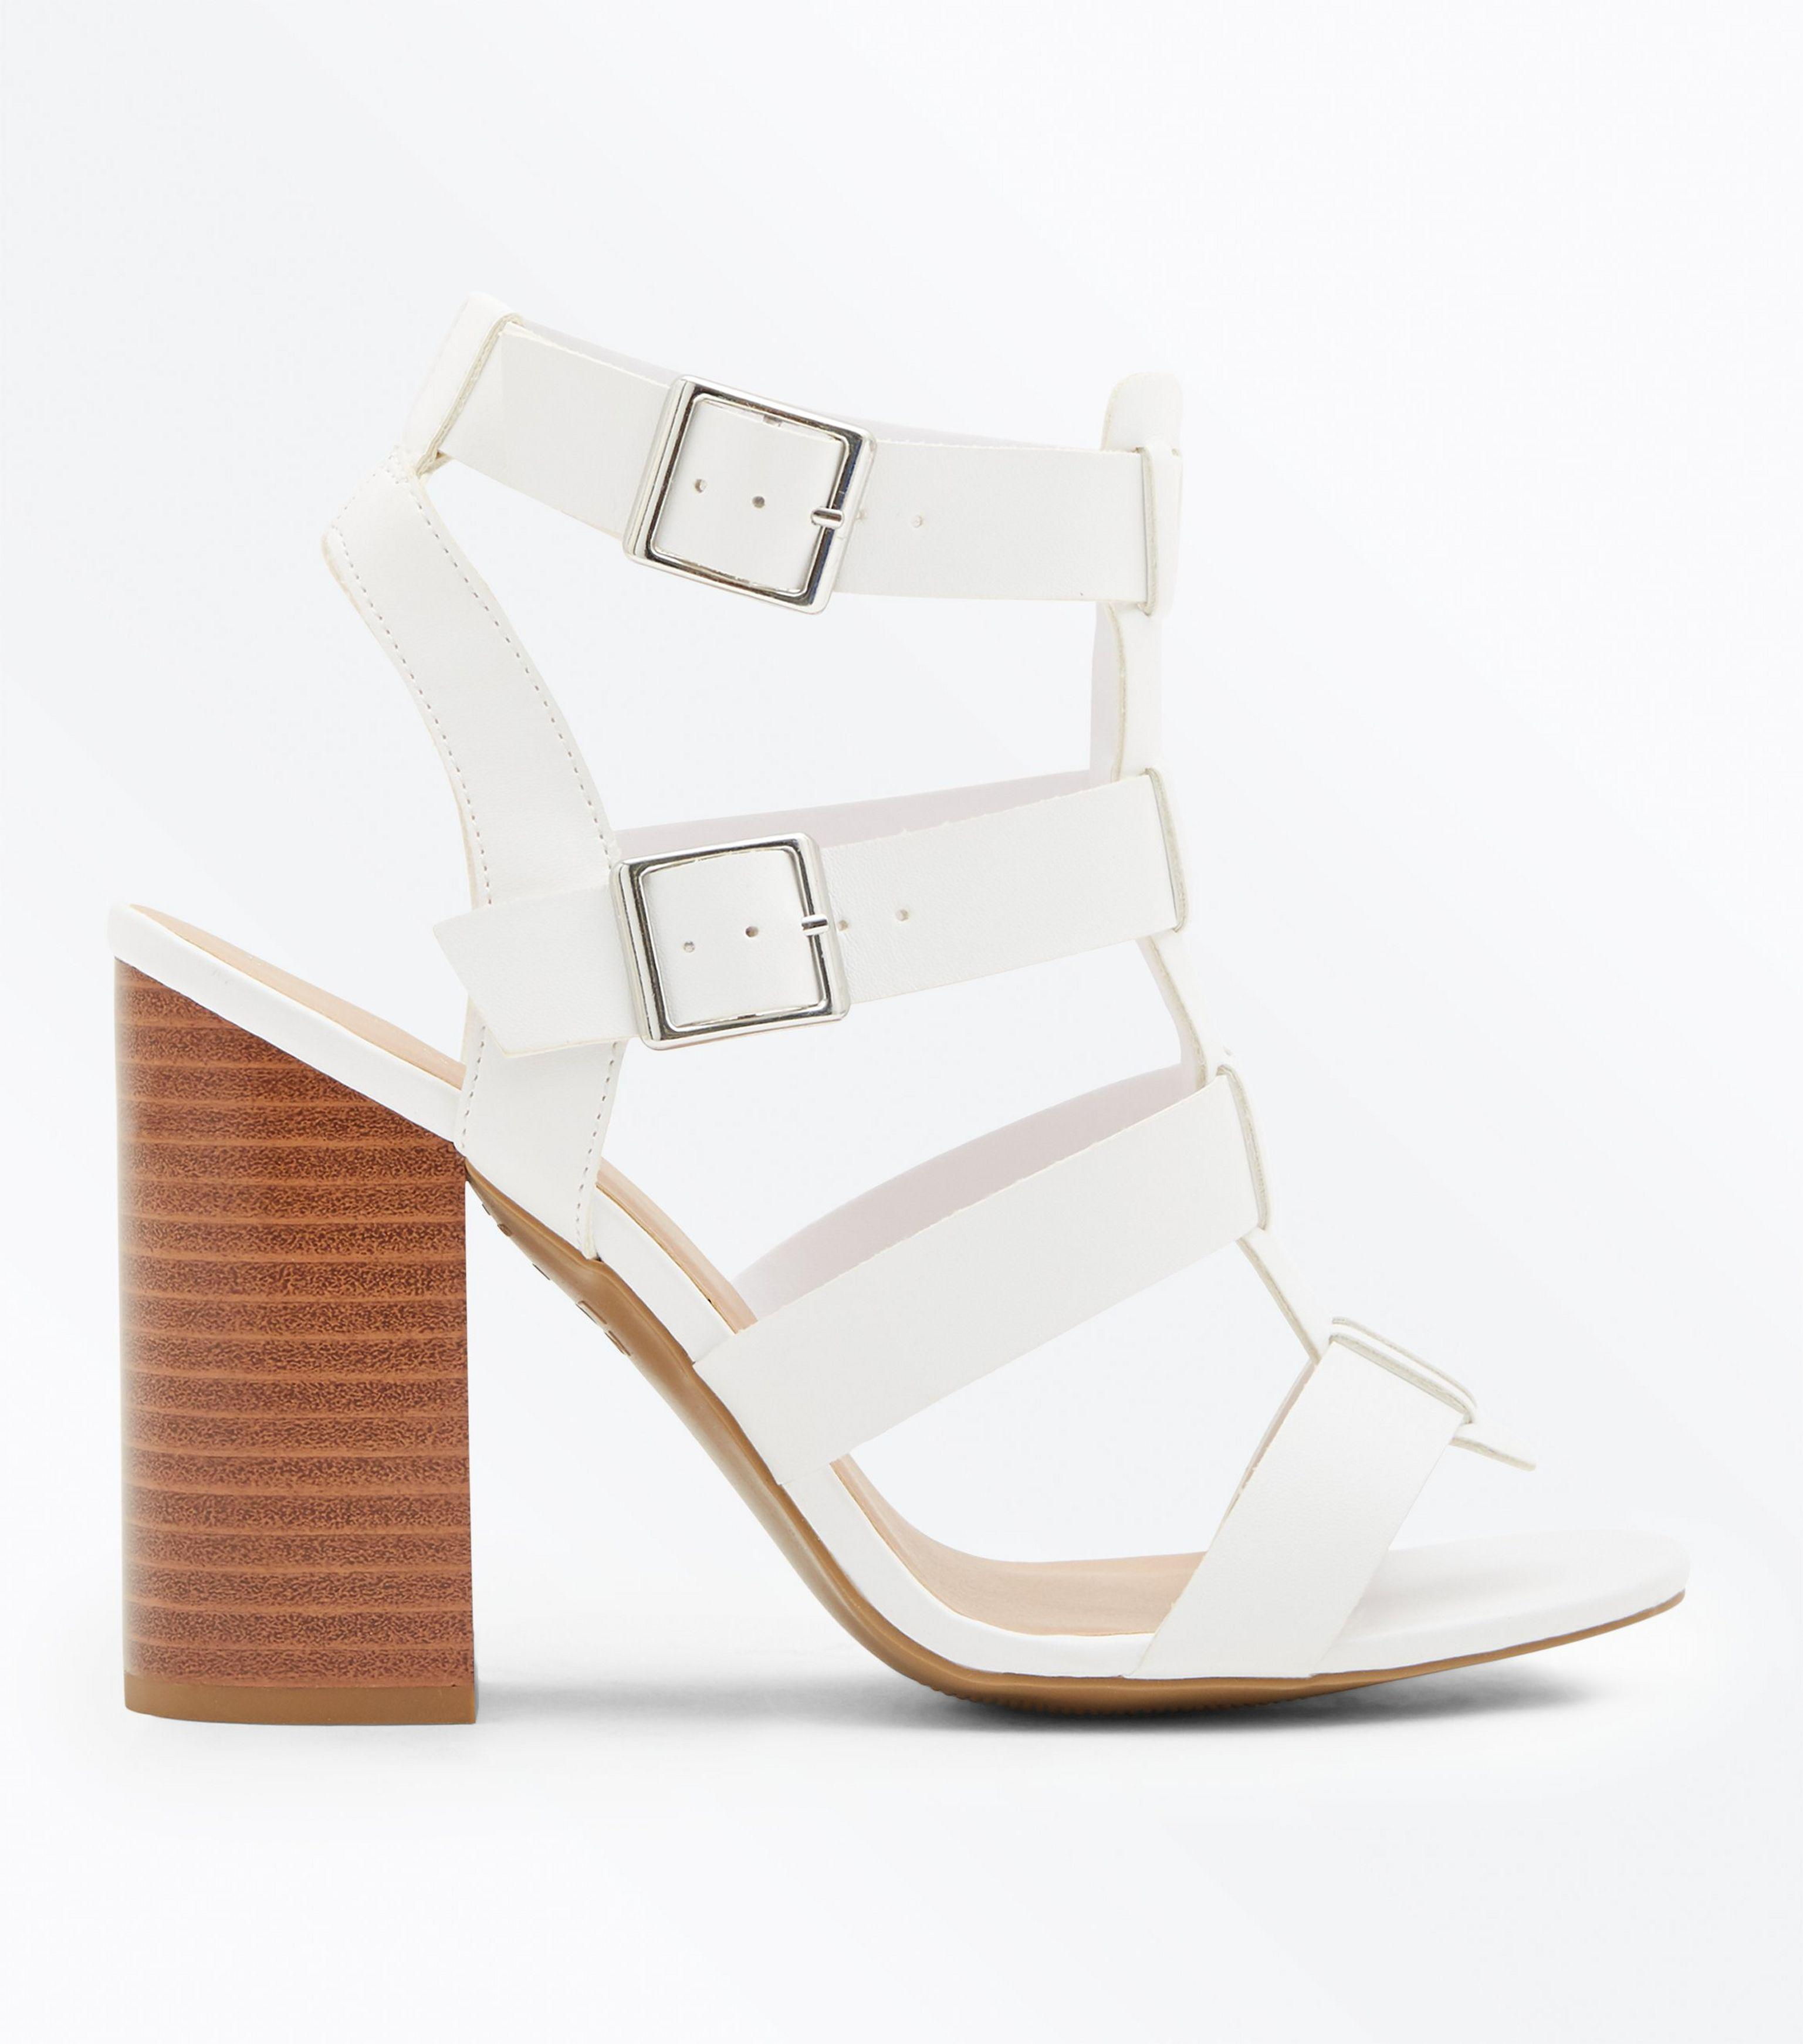 e7b400dfbb6 New Look White Wooden Block Heel Gladiator Sandals in White - Lyst